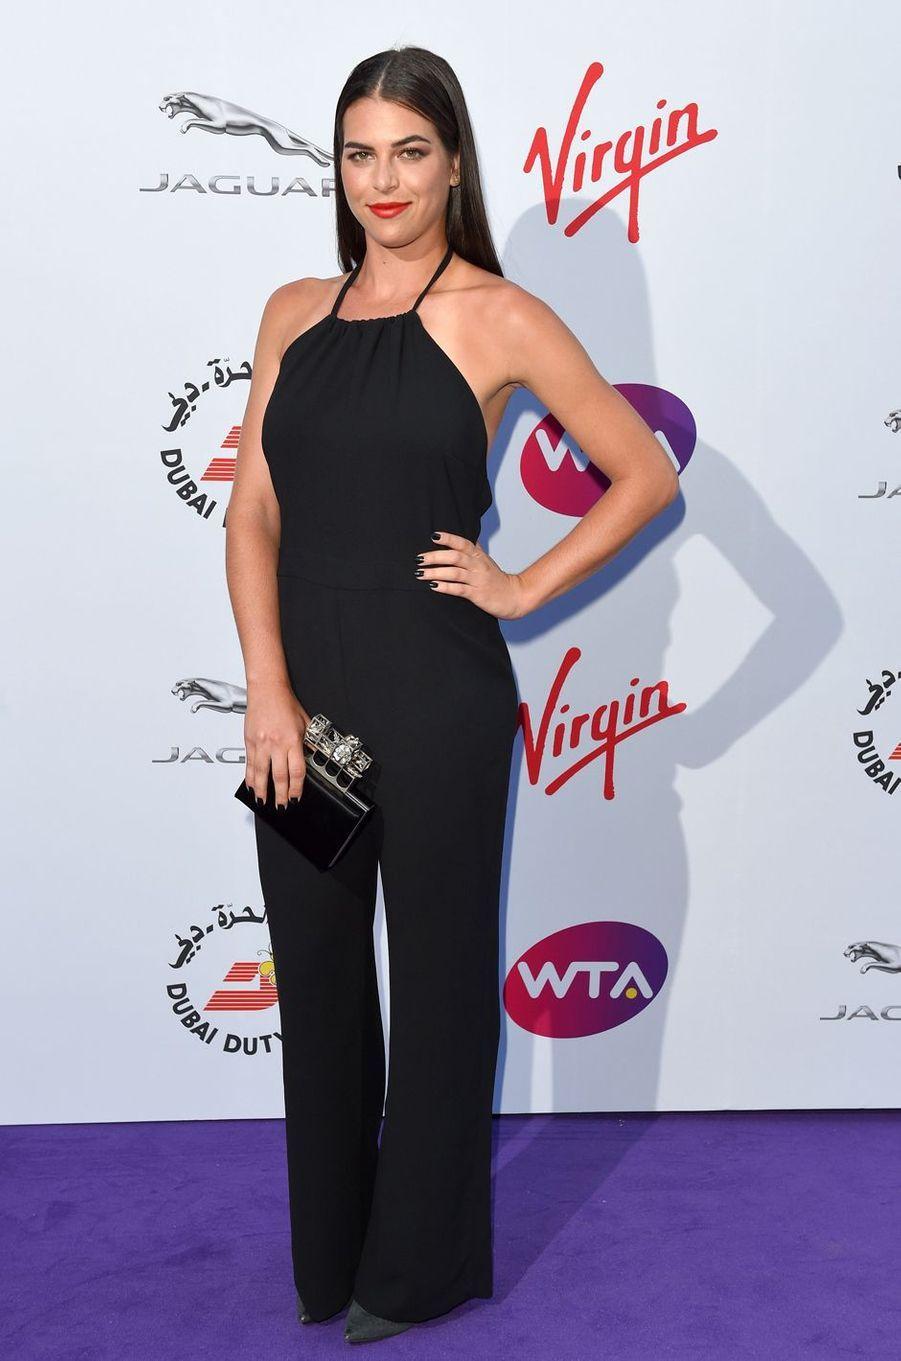 Ajla Tomljanovic, compagne de Nick Kyrgios.